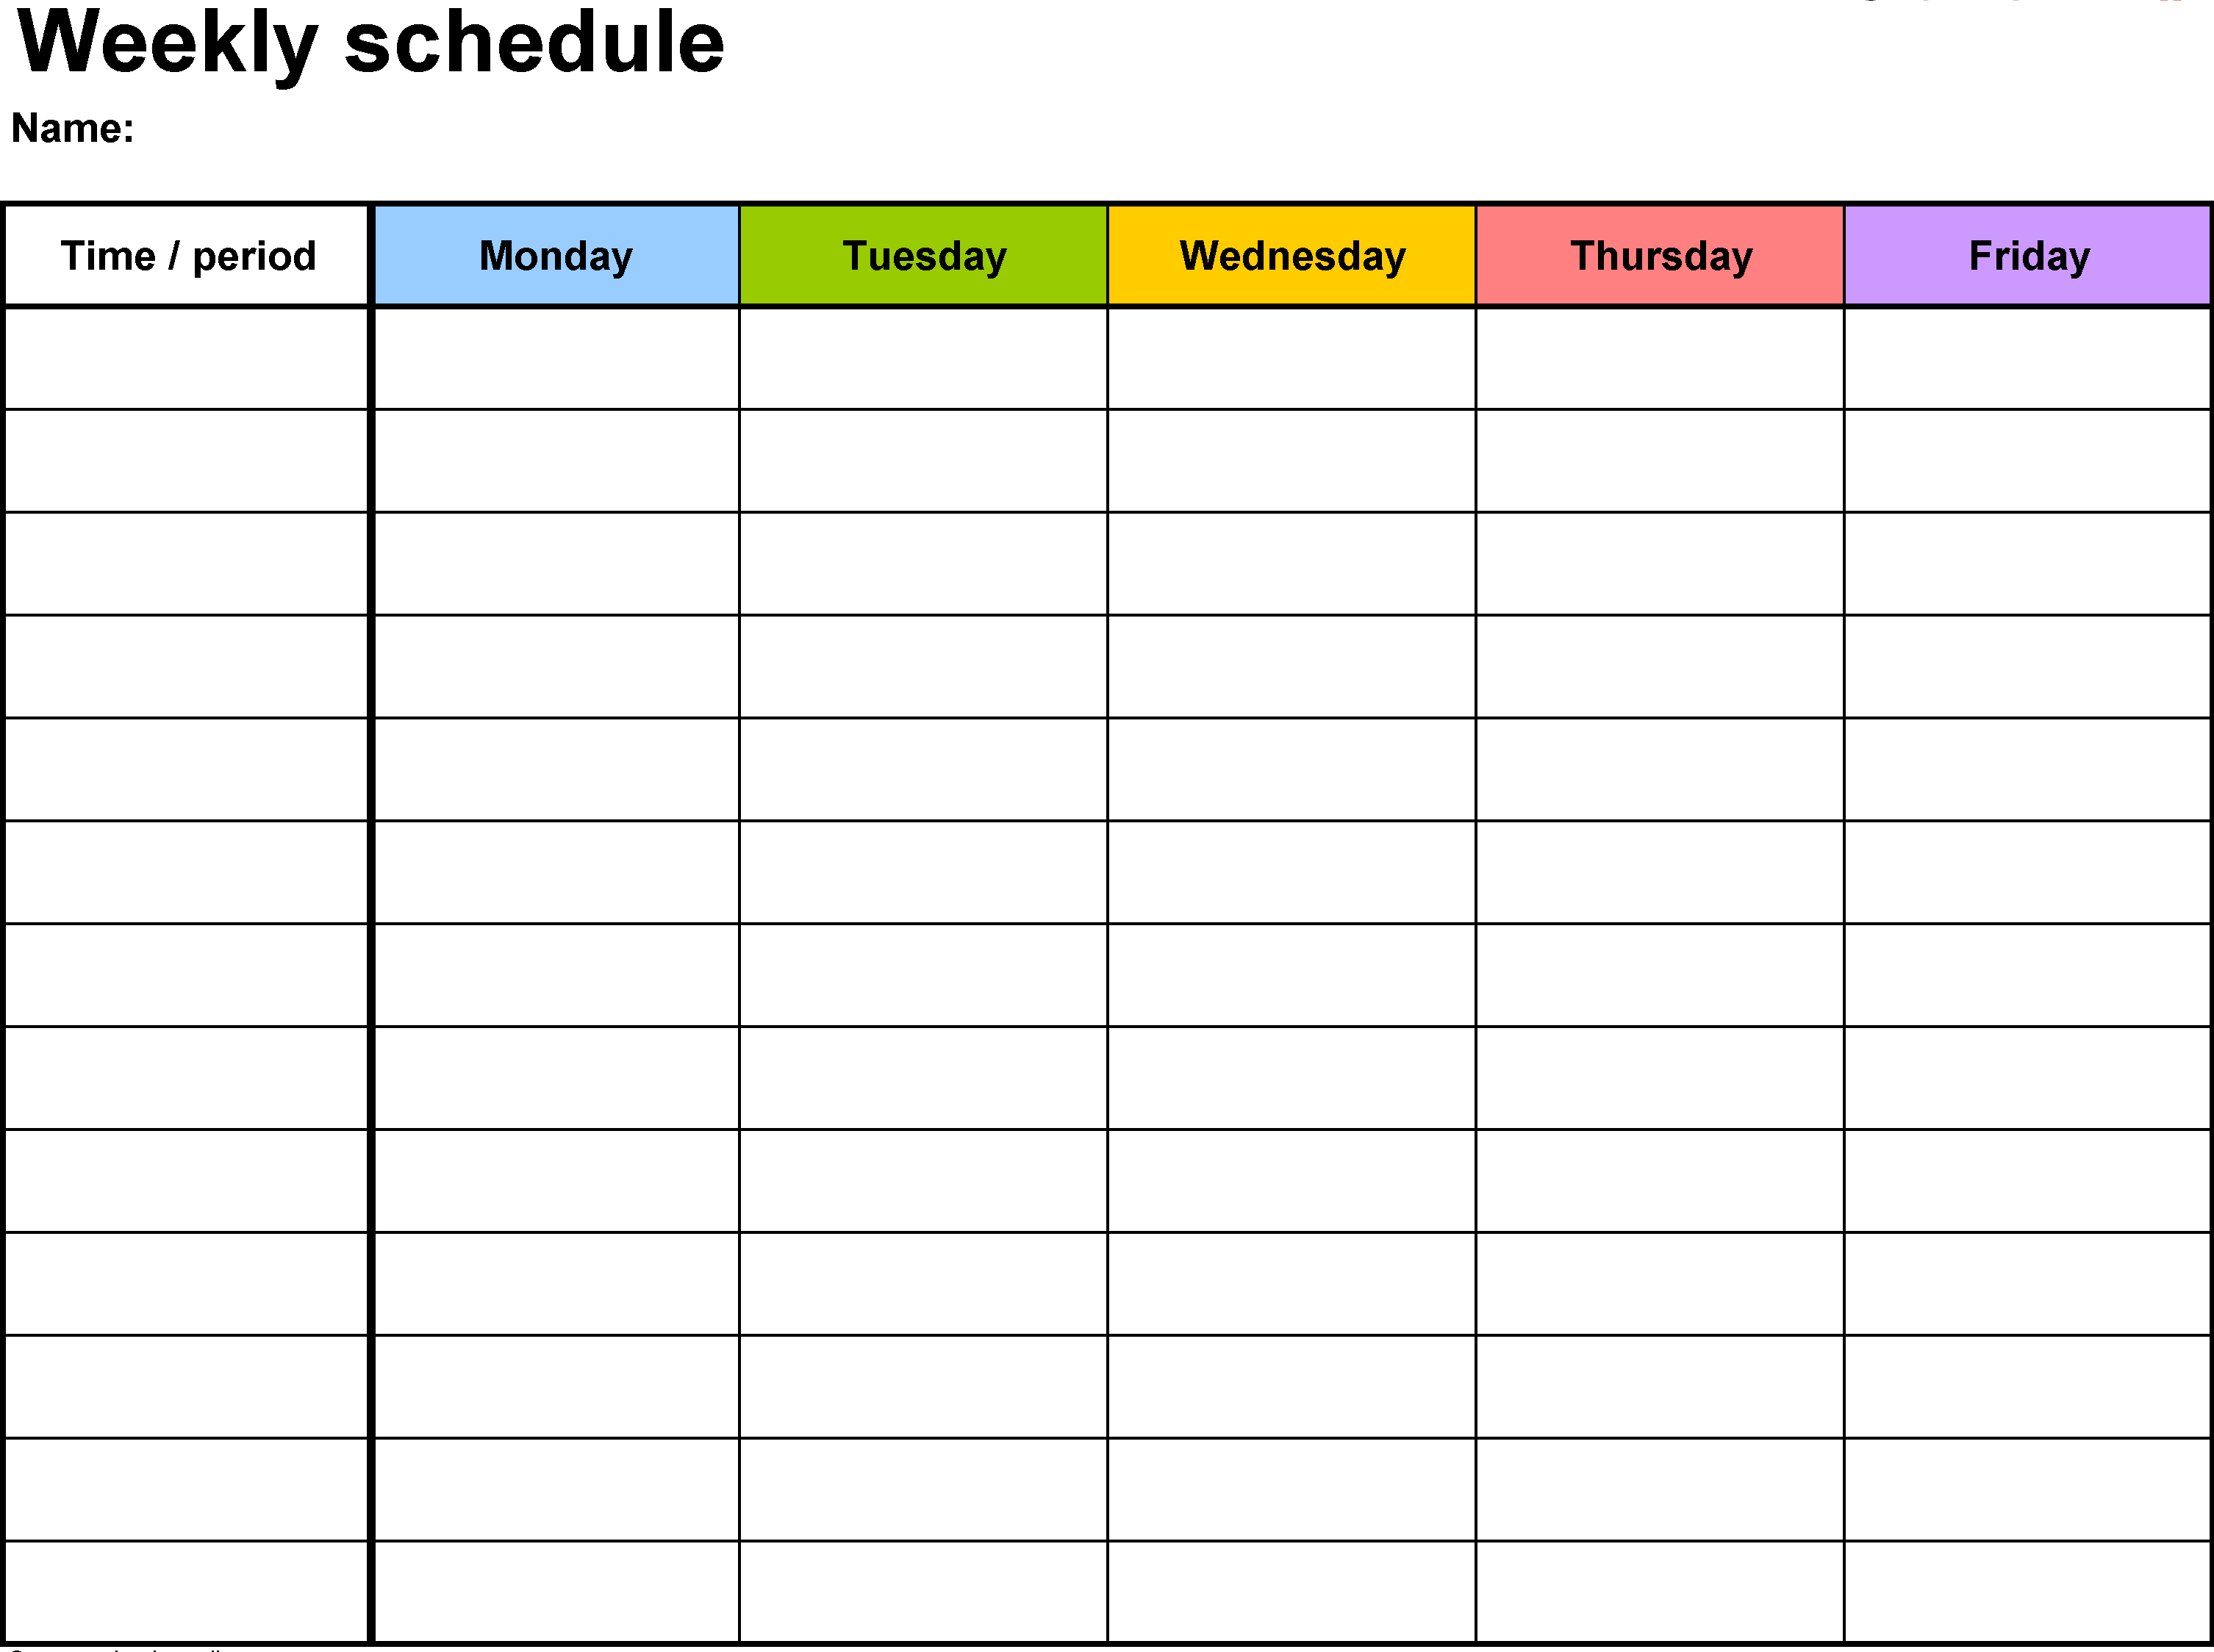 Weekly Calendar Template | Weekly Calendar Template - Word